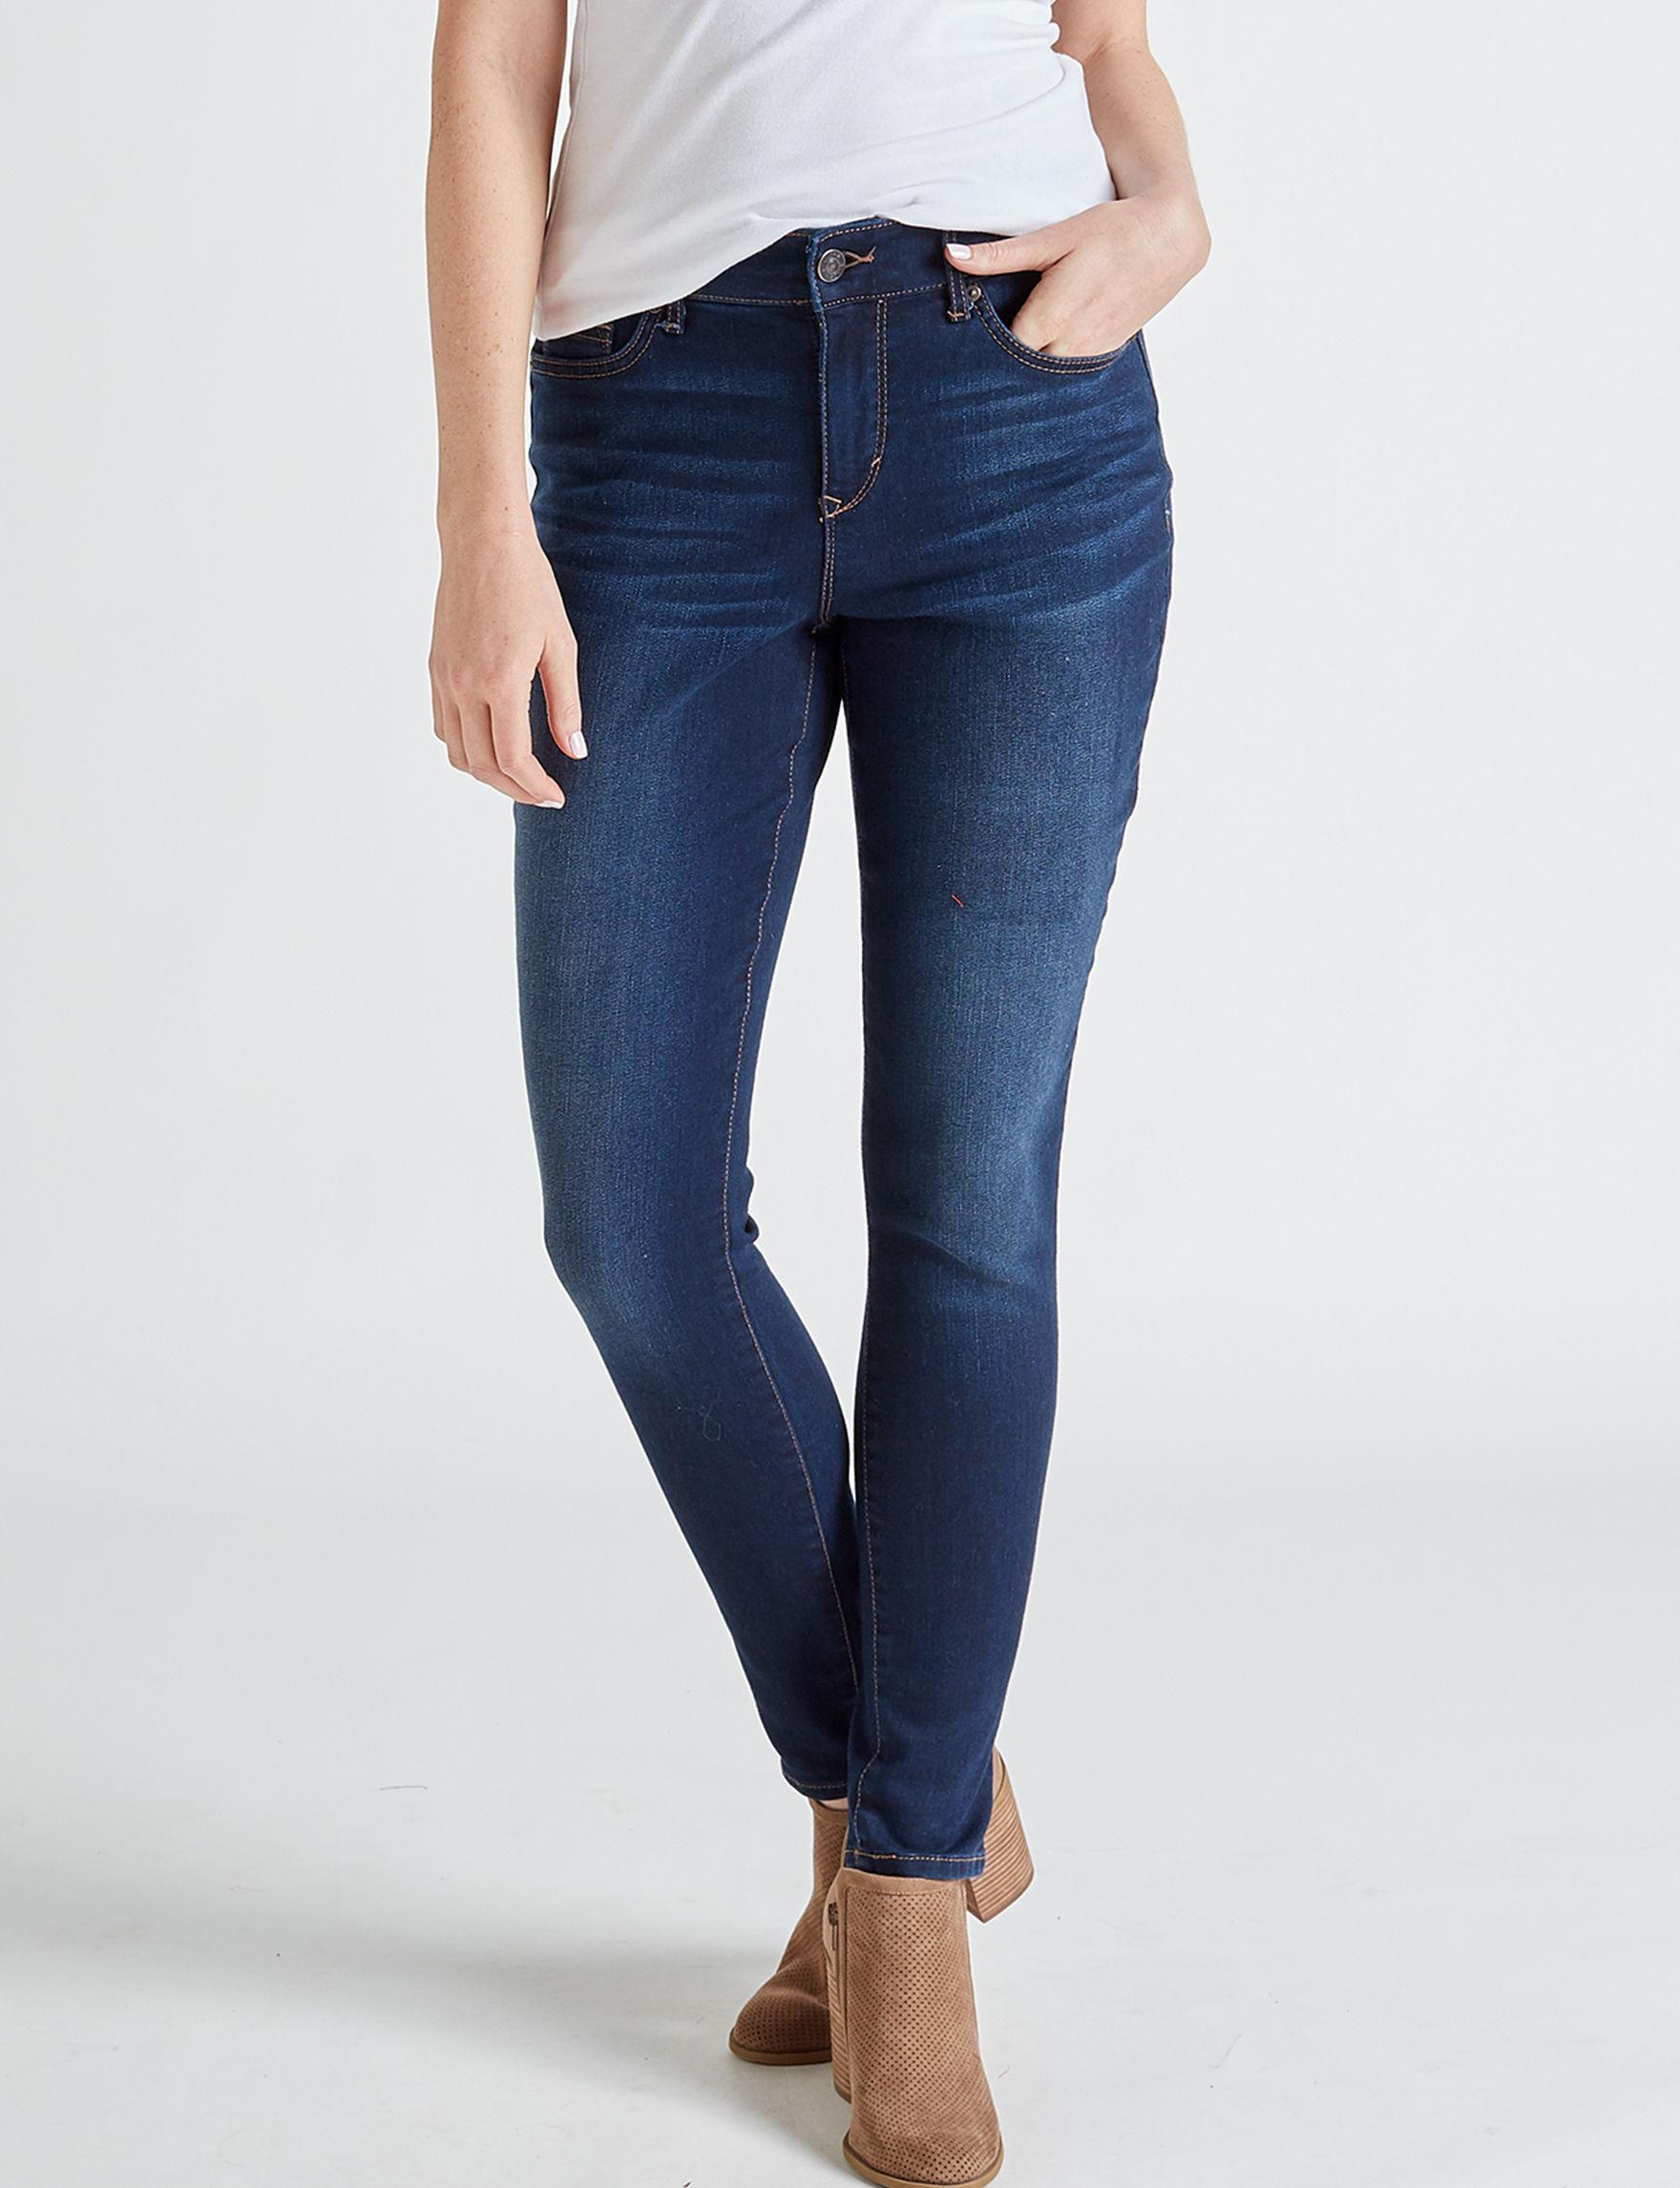 Gloria Vanderbilt Medium Blue Skinny